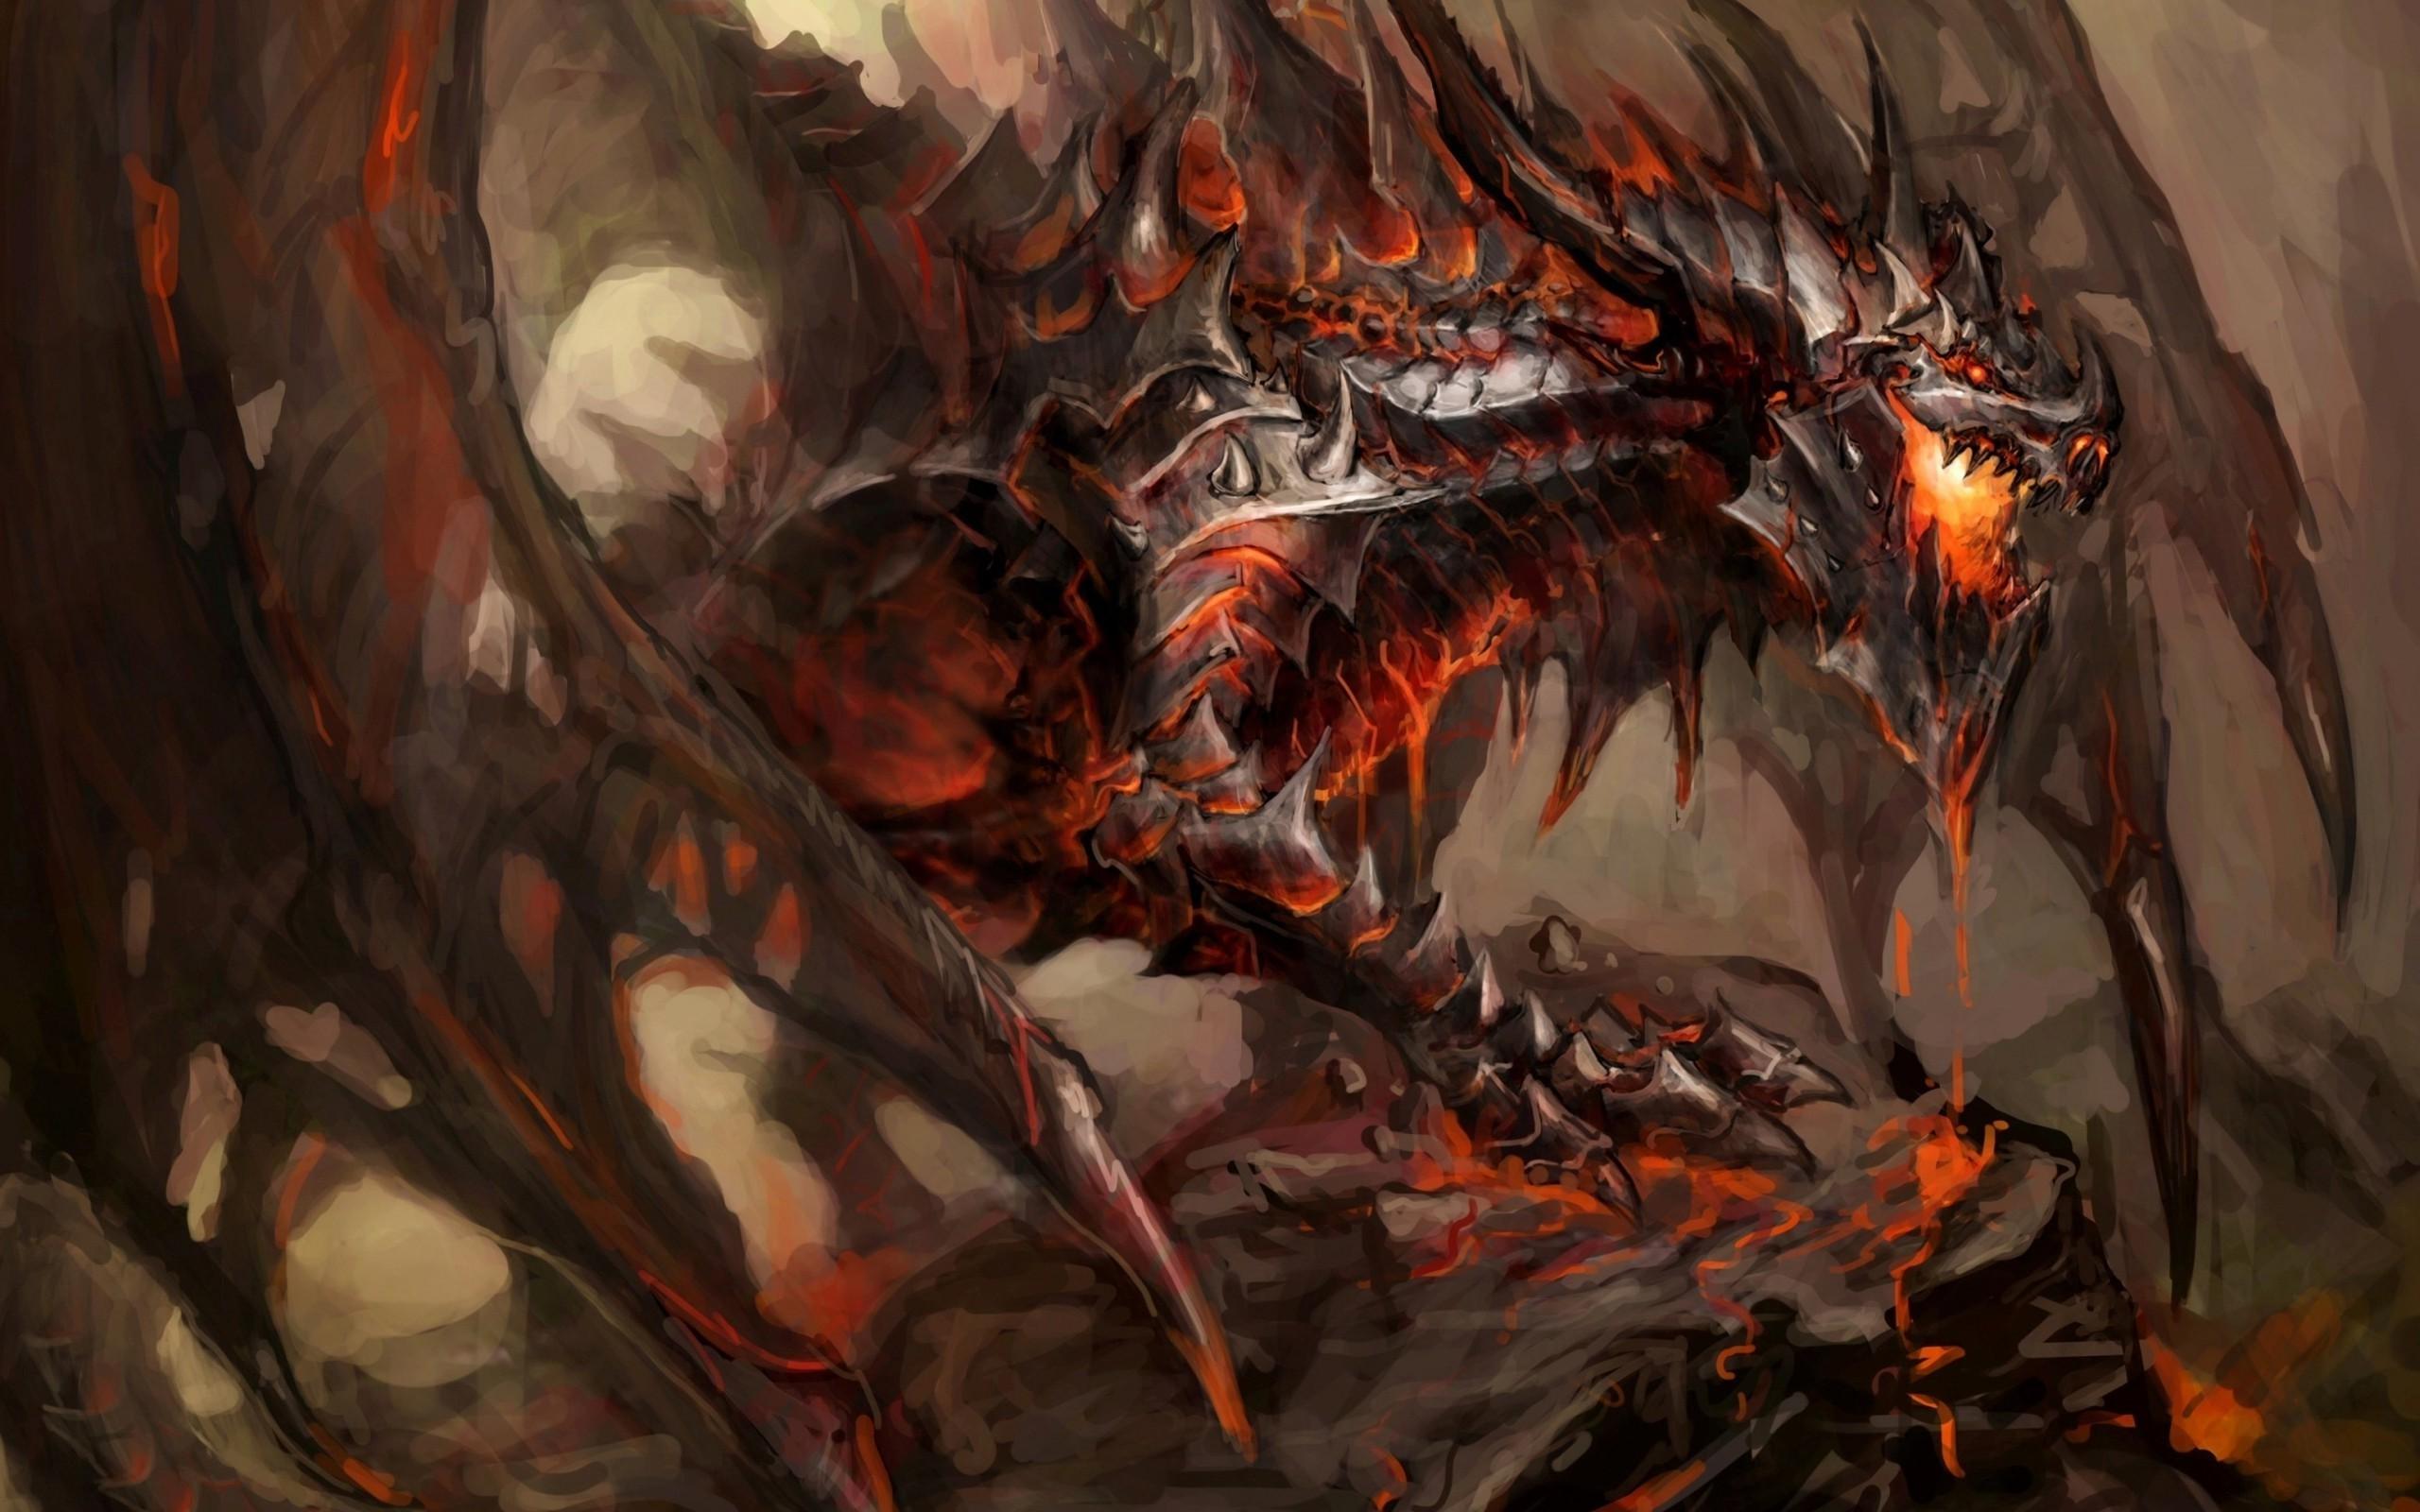 Wallpaper 2560x1600 Px Deathwing Dragon Fantasy Art World Of